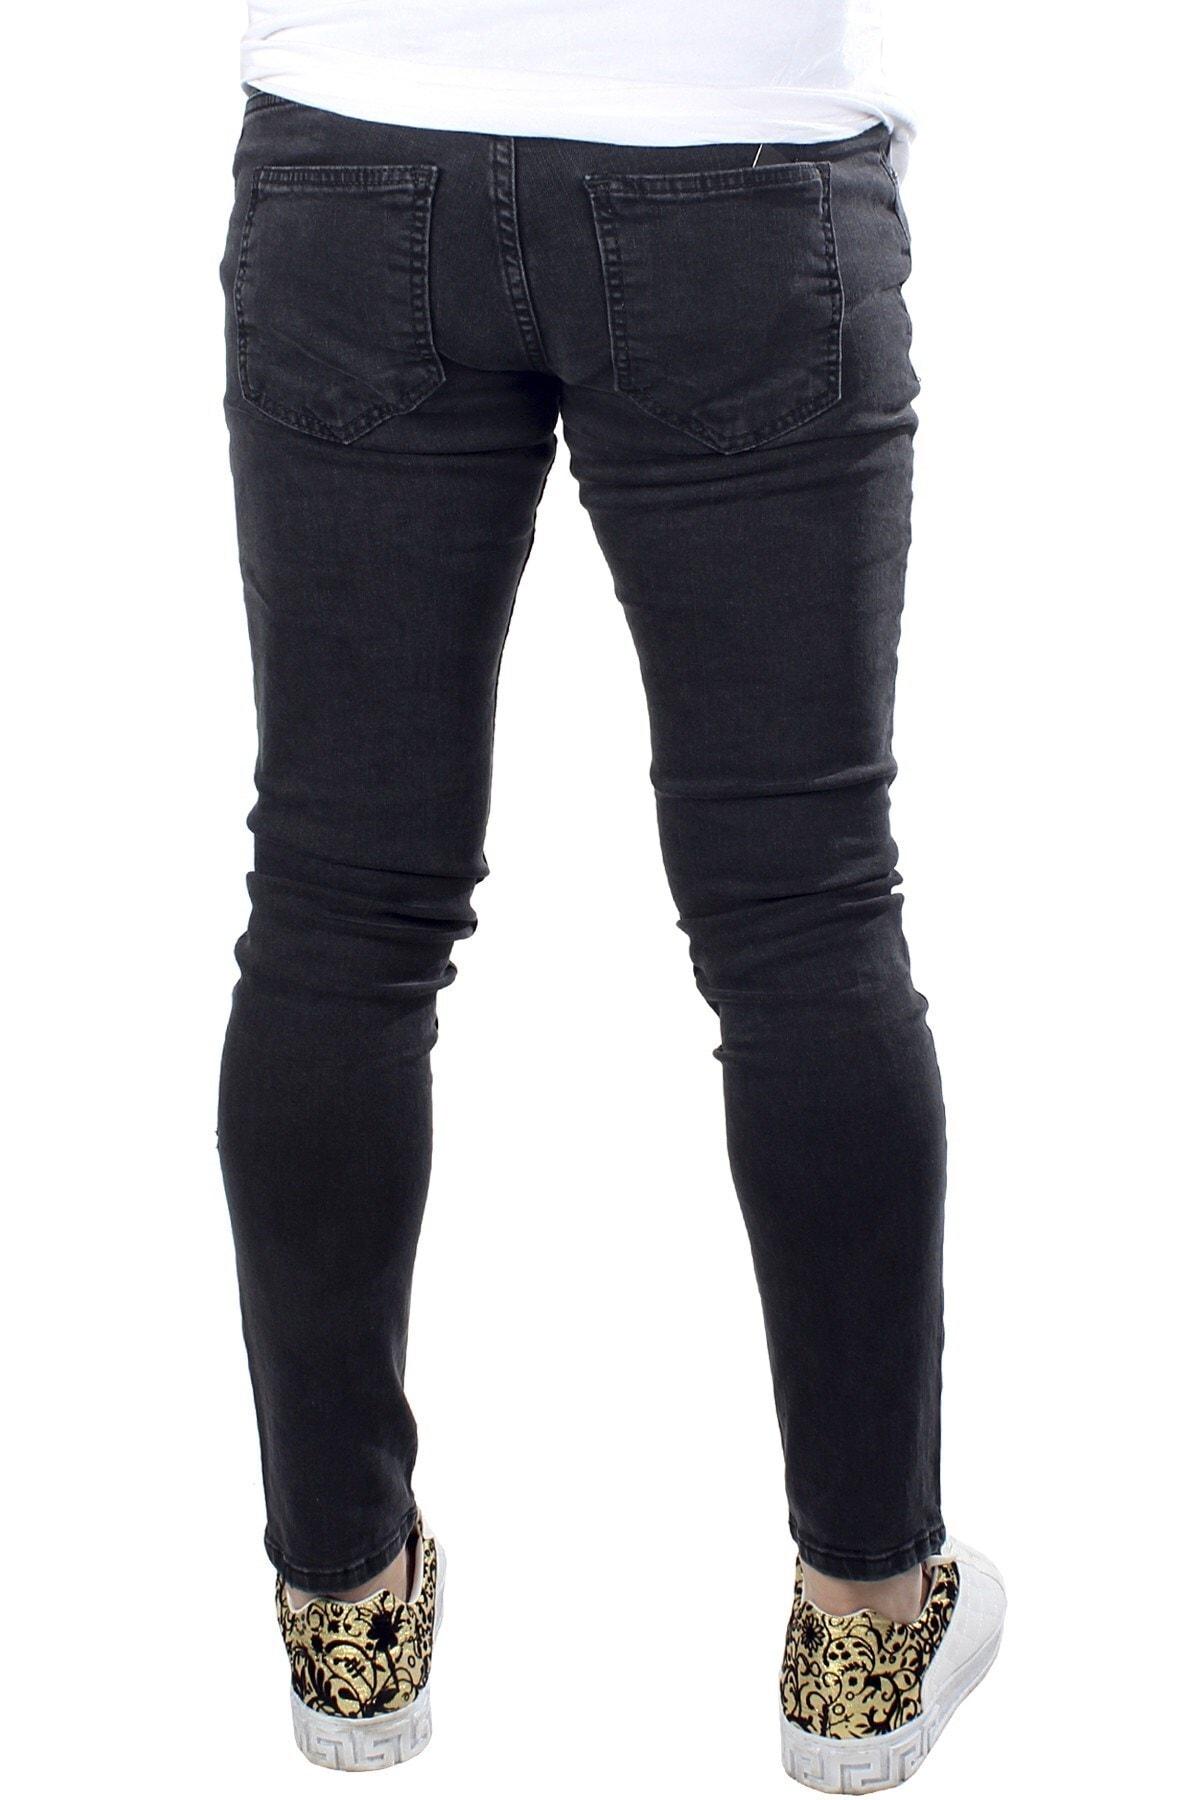 Terapi Men Erkek Kot Pantolon 9K-2100341-007 Füme 3